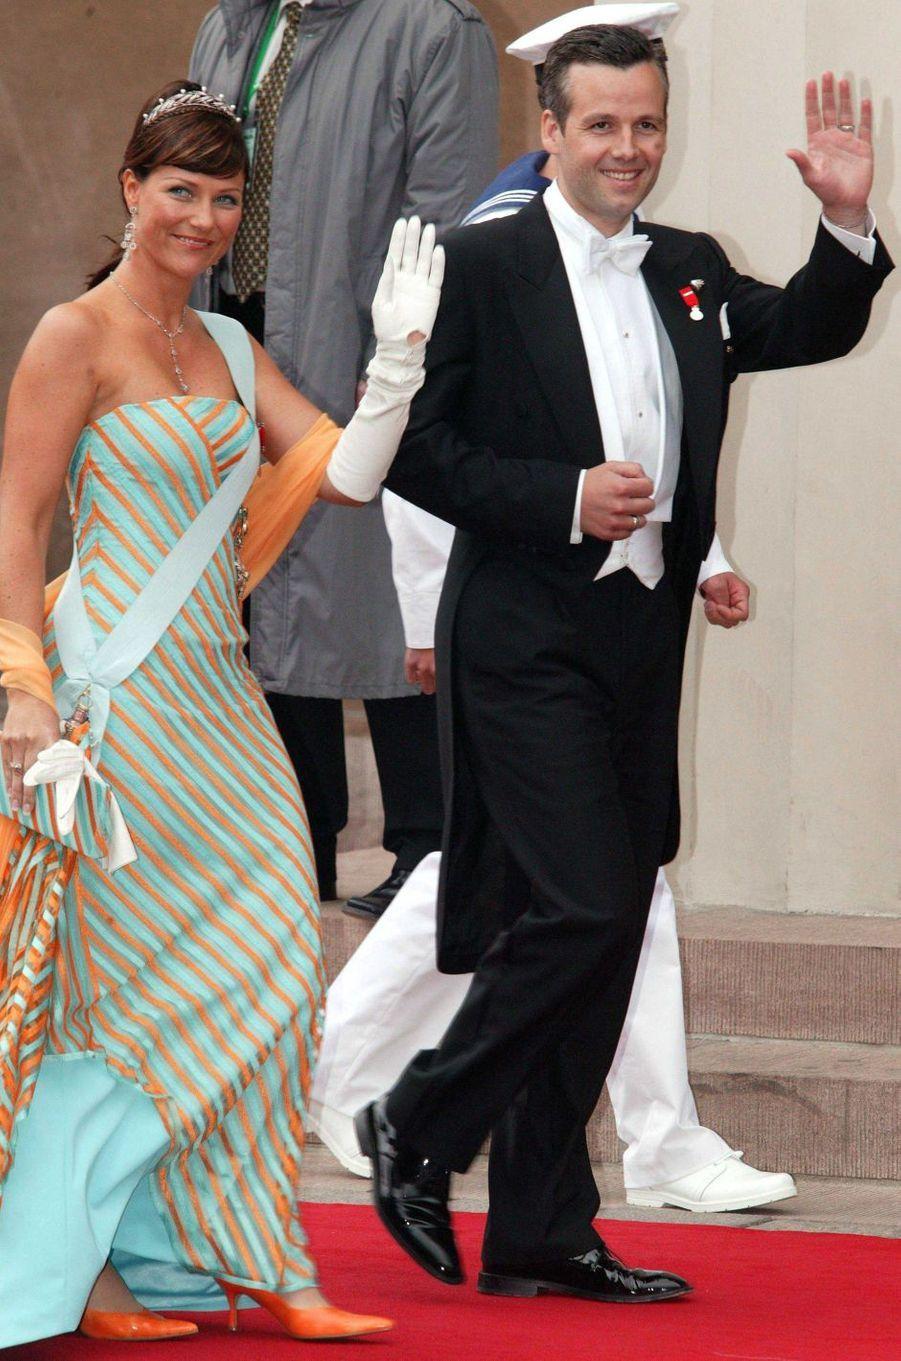 La princesse Märtha Louise de Norvège et son mari Ari Behn à Copenhague, le 14 mai 2004